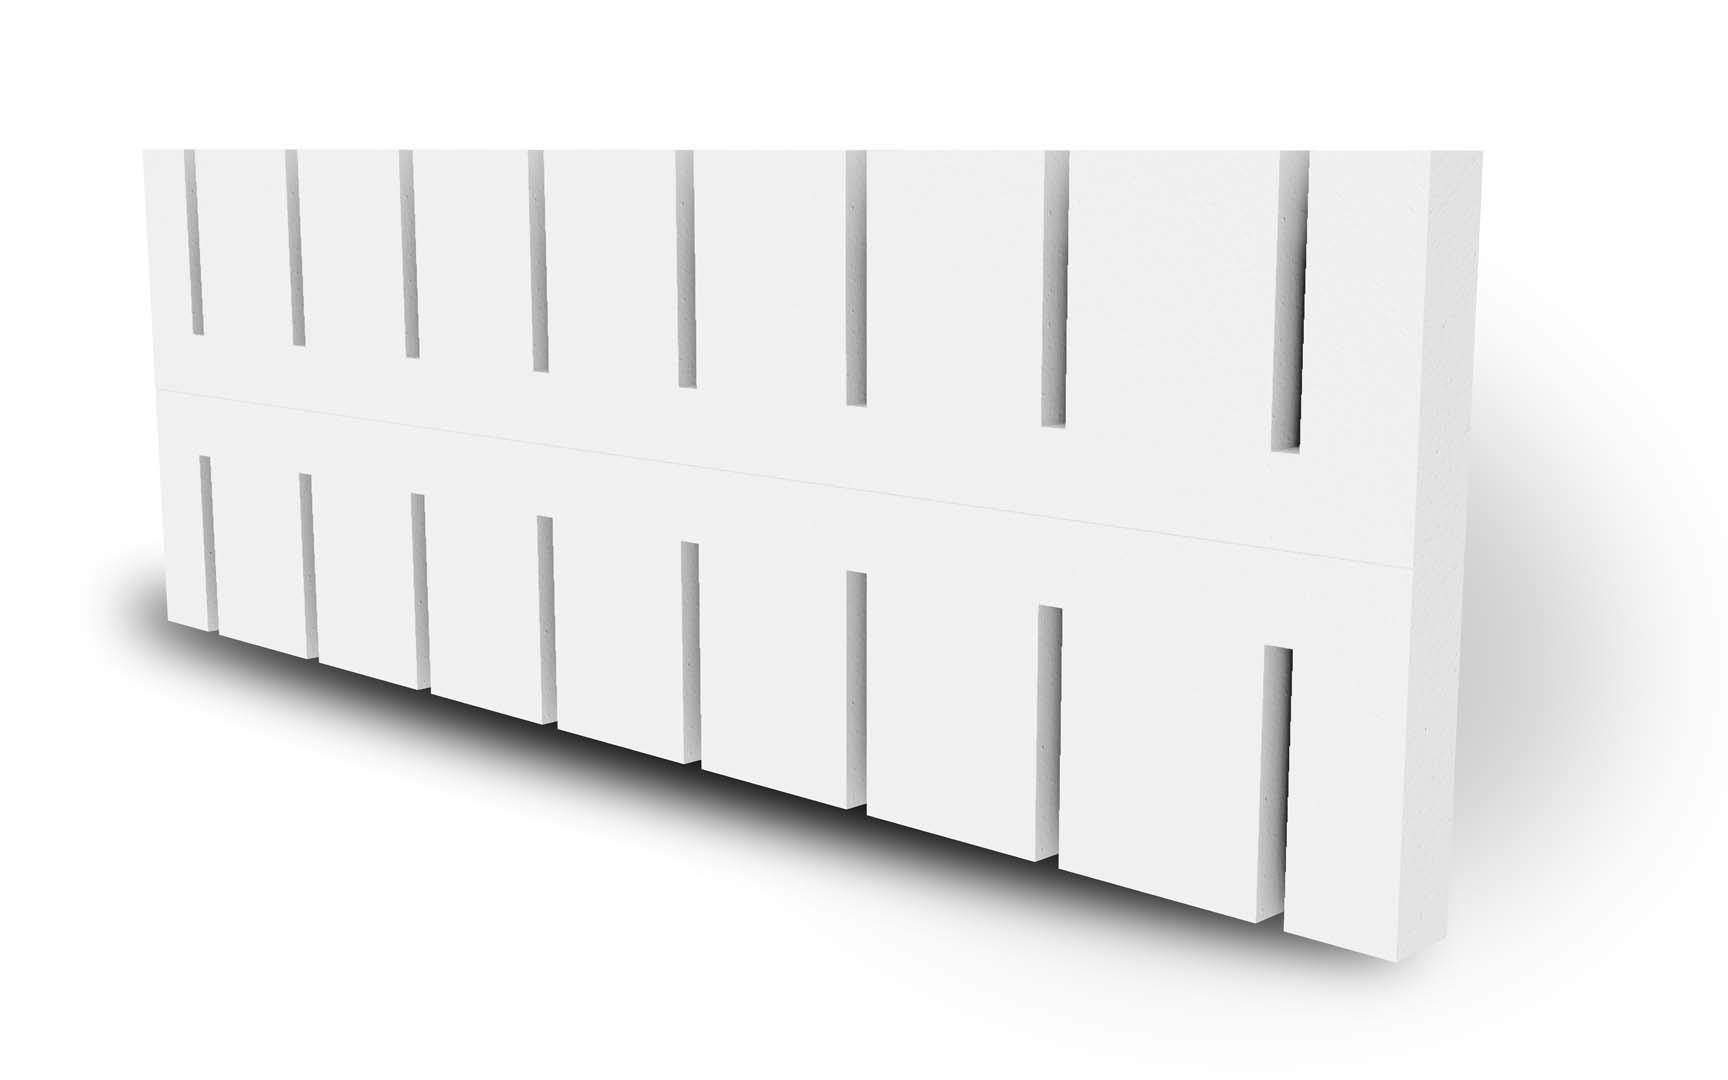 ThermalSert Insulation Insert